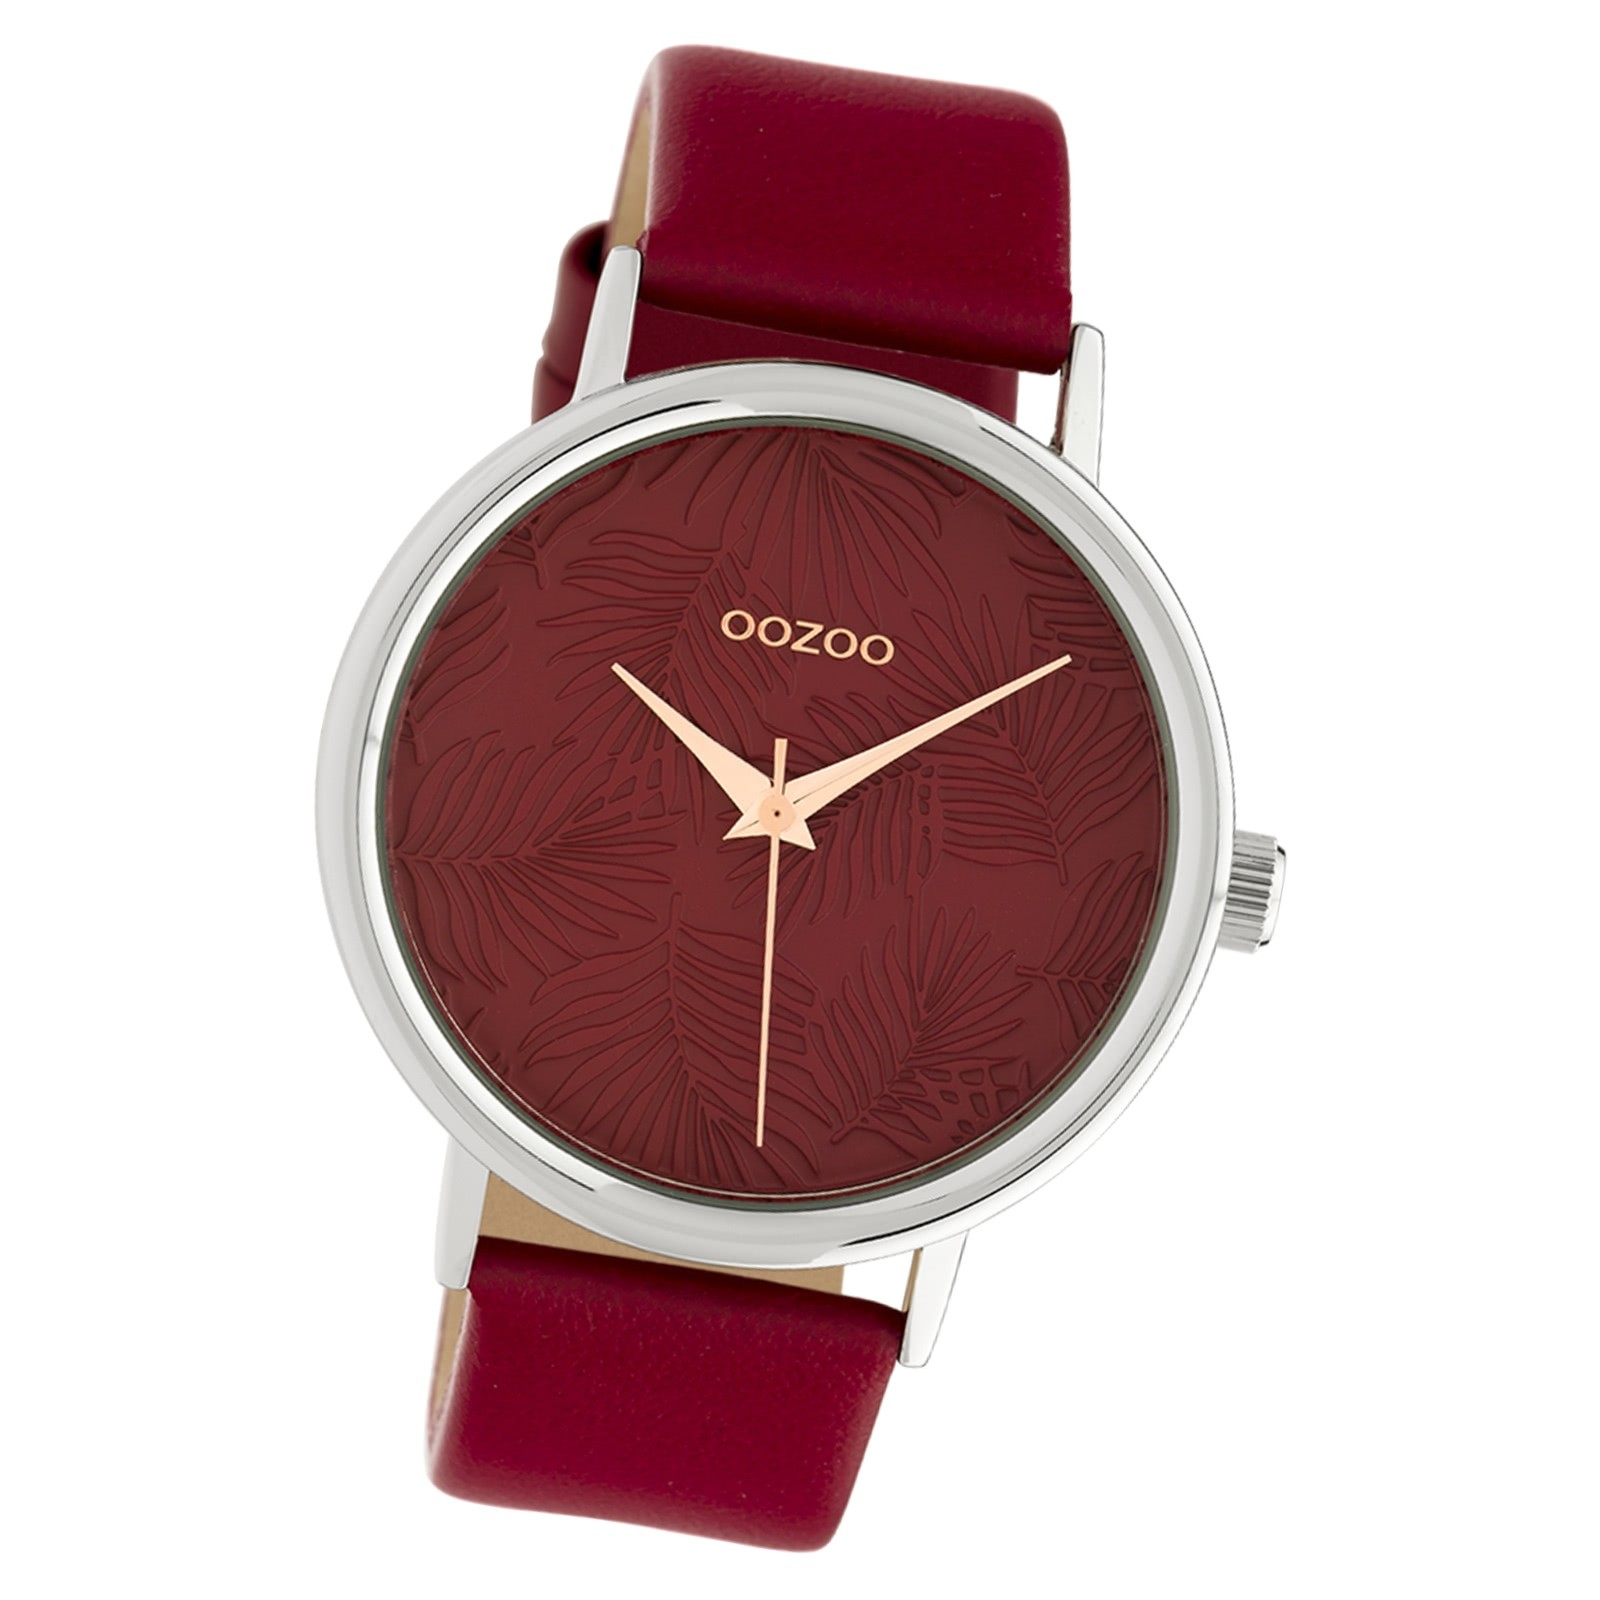 Oozoo Damen Armbanduhr Timepieces C10163 42mm Quarz Leder rot UOC10163